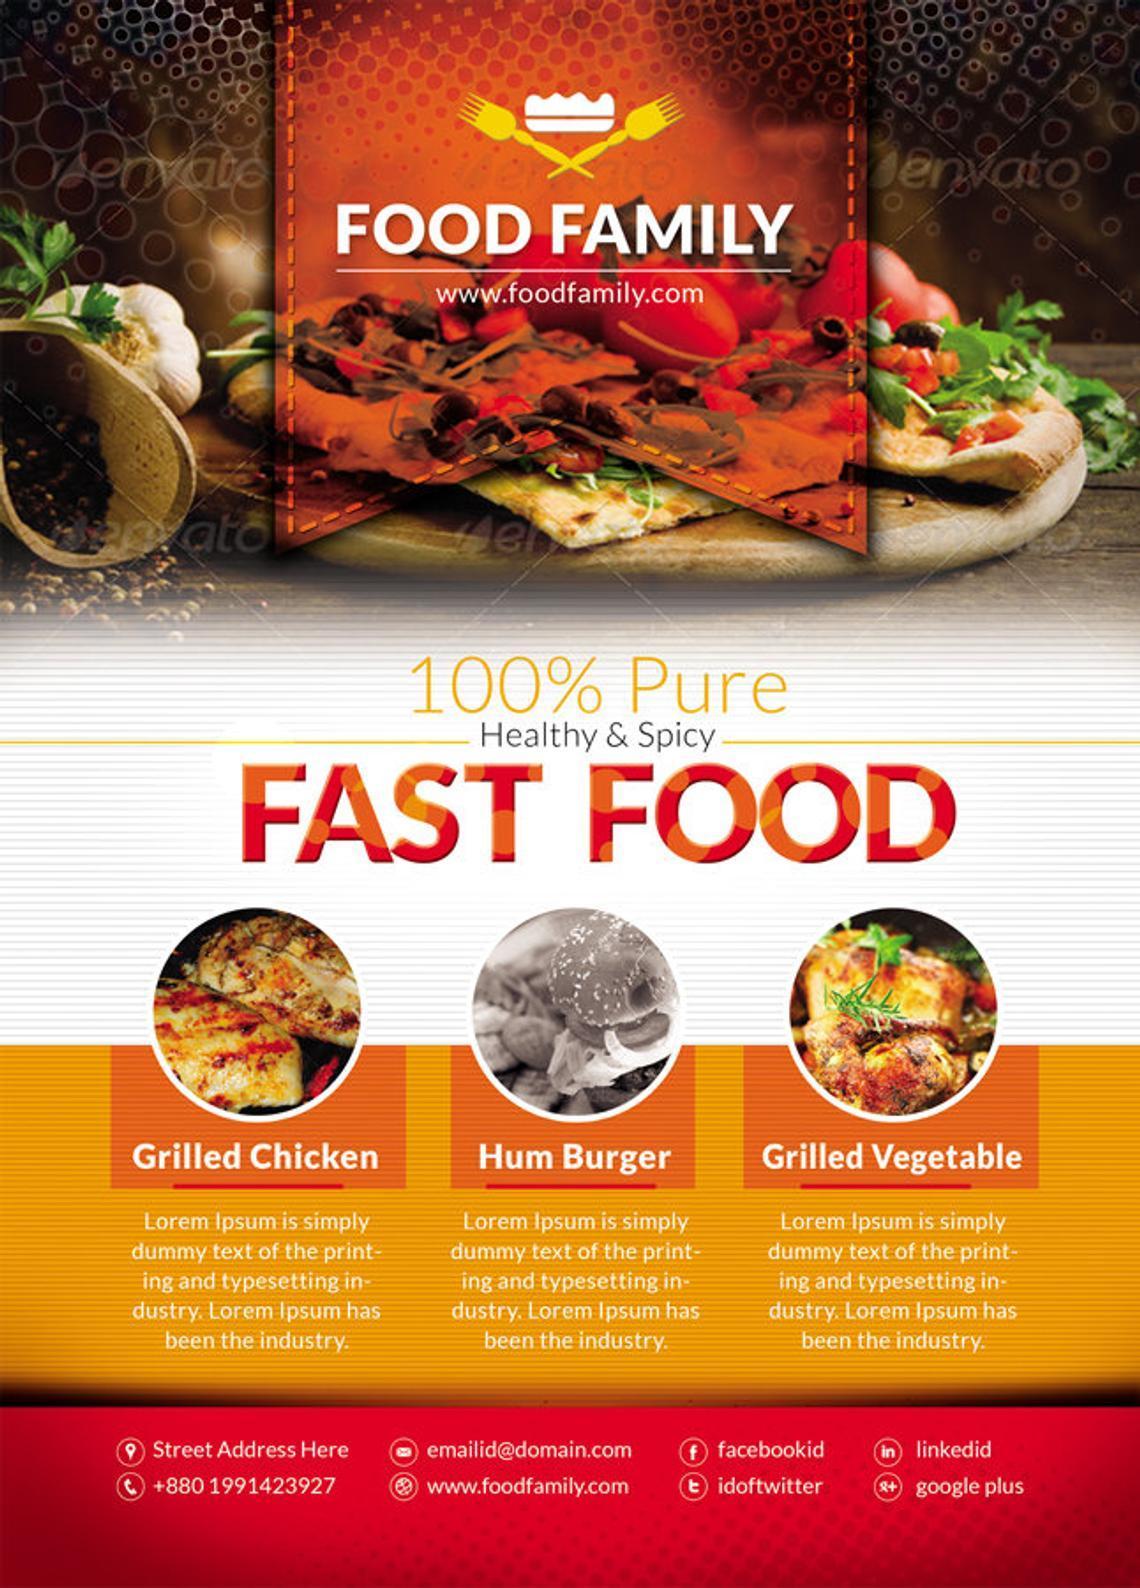 Food Family - Fast Food Restaurant Flyer and Poster Design Template, Slide 4, 08839, Food & Beverage — PoweredTemplate.com